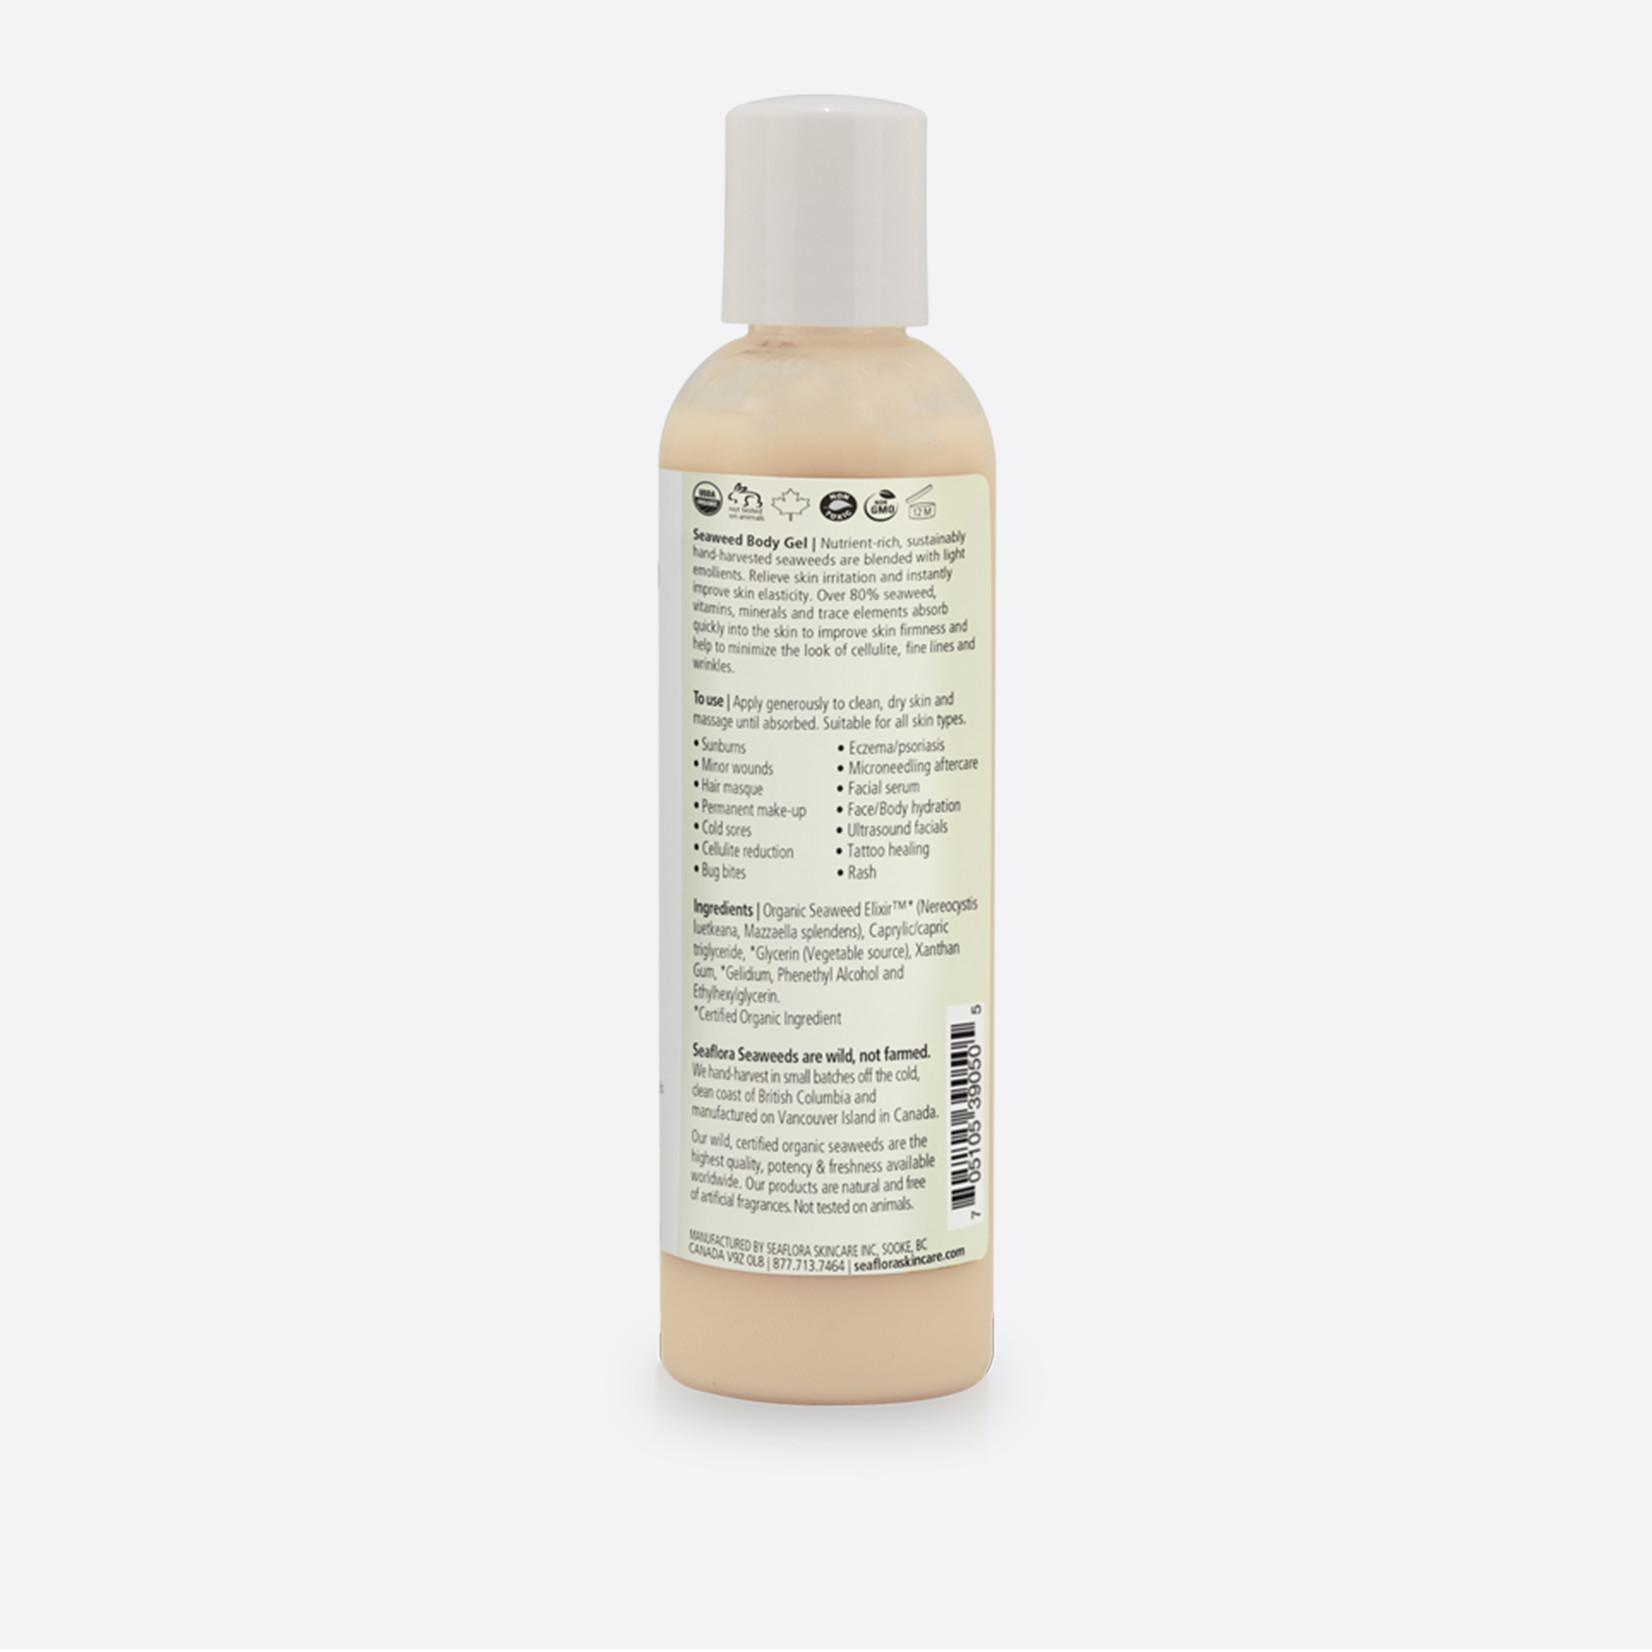 Seaflora Skincare Seaweed Body Gel